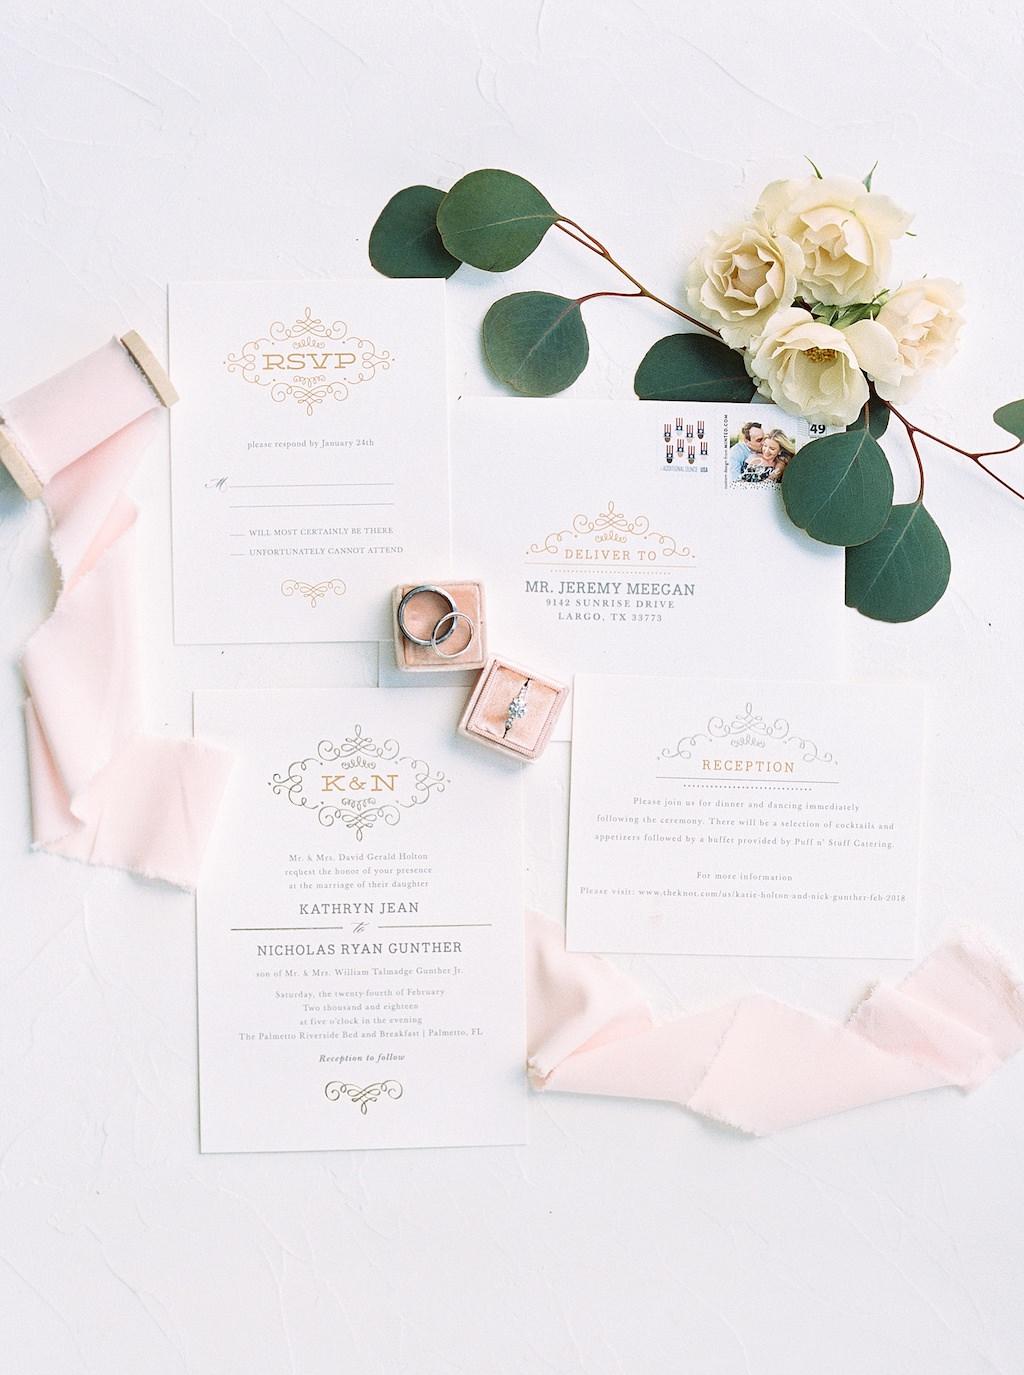 Modern Elegant White and Gold Foil Wedding Invitation Suite, Engagement Ring and Wedding Rings in Blush Pink Velvet Ring Box